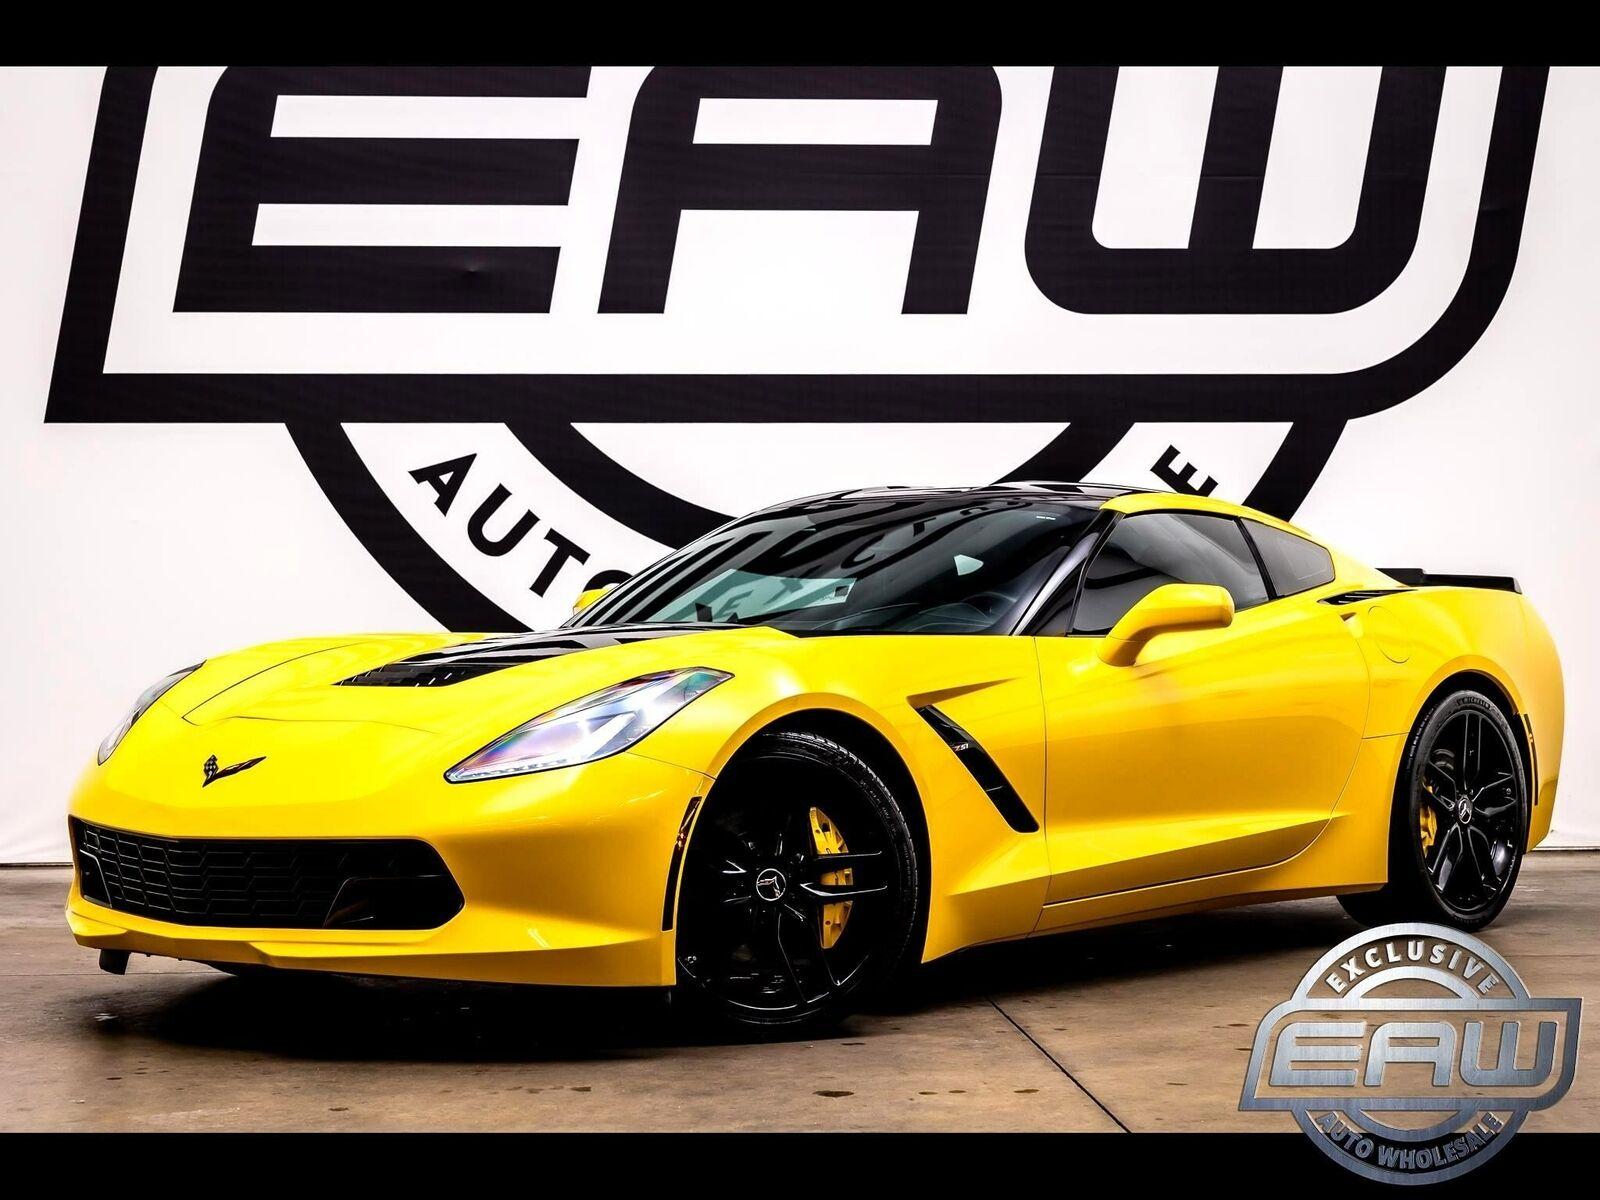 2014 Yellow Chevrolet Corvette Coupe 2LT   C7 Corvette Photo 1